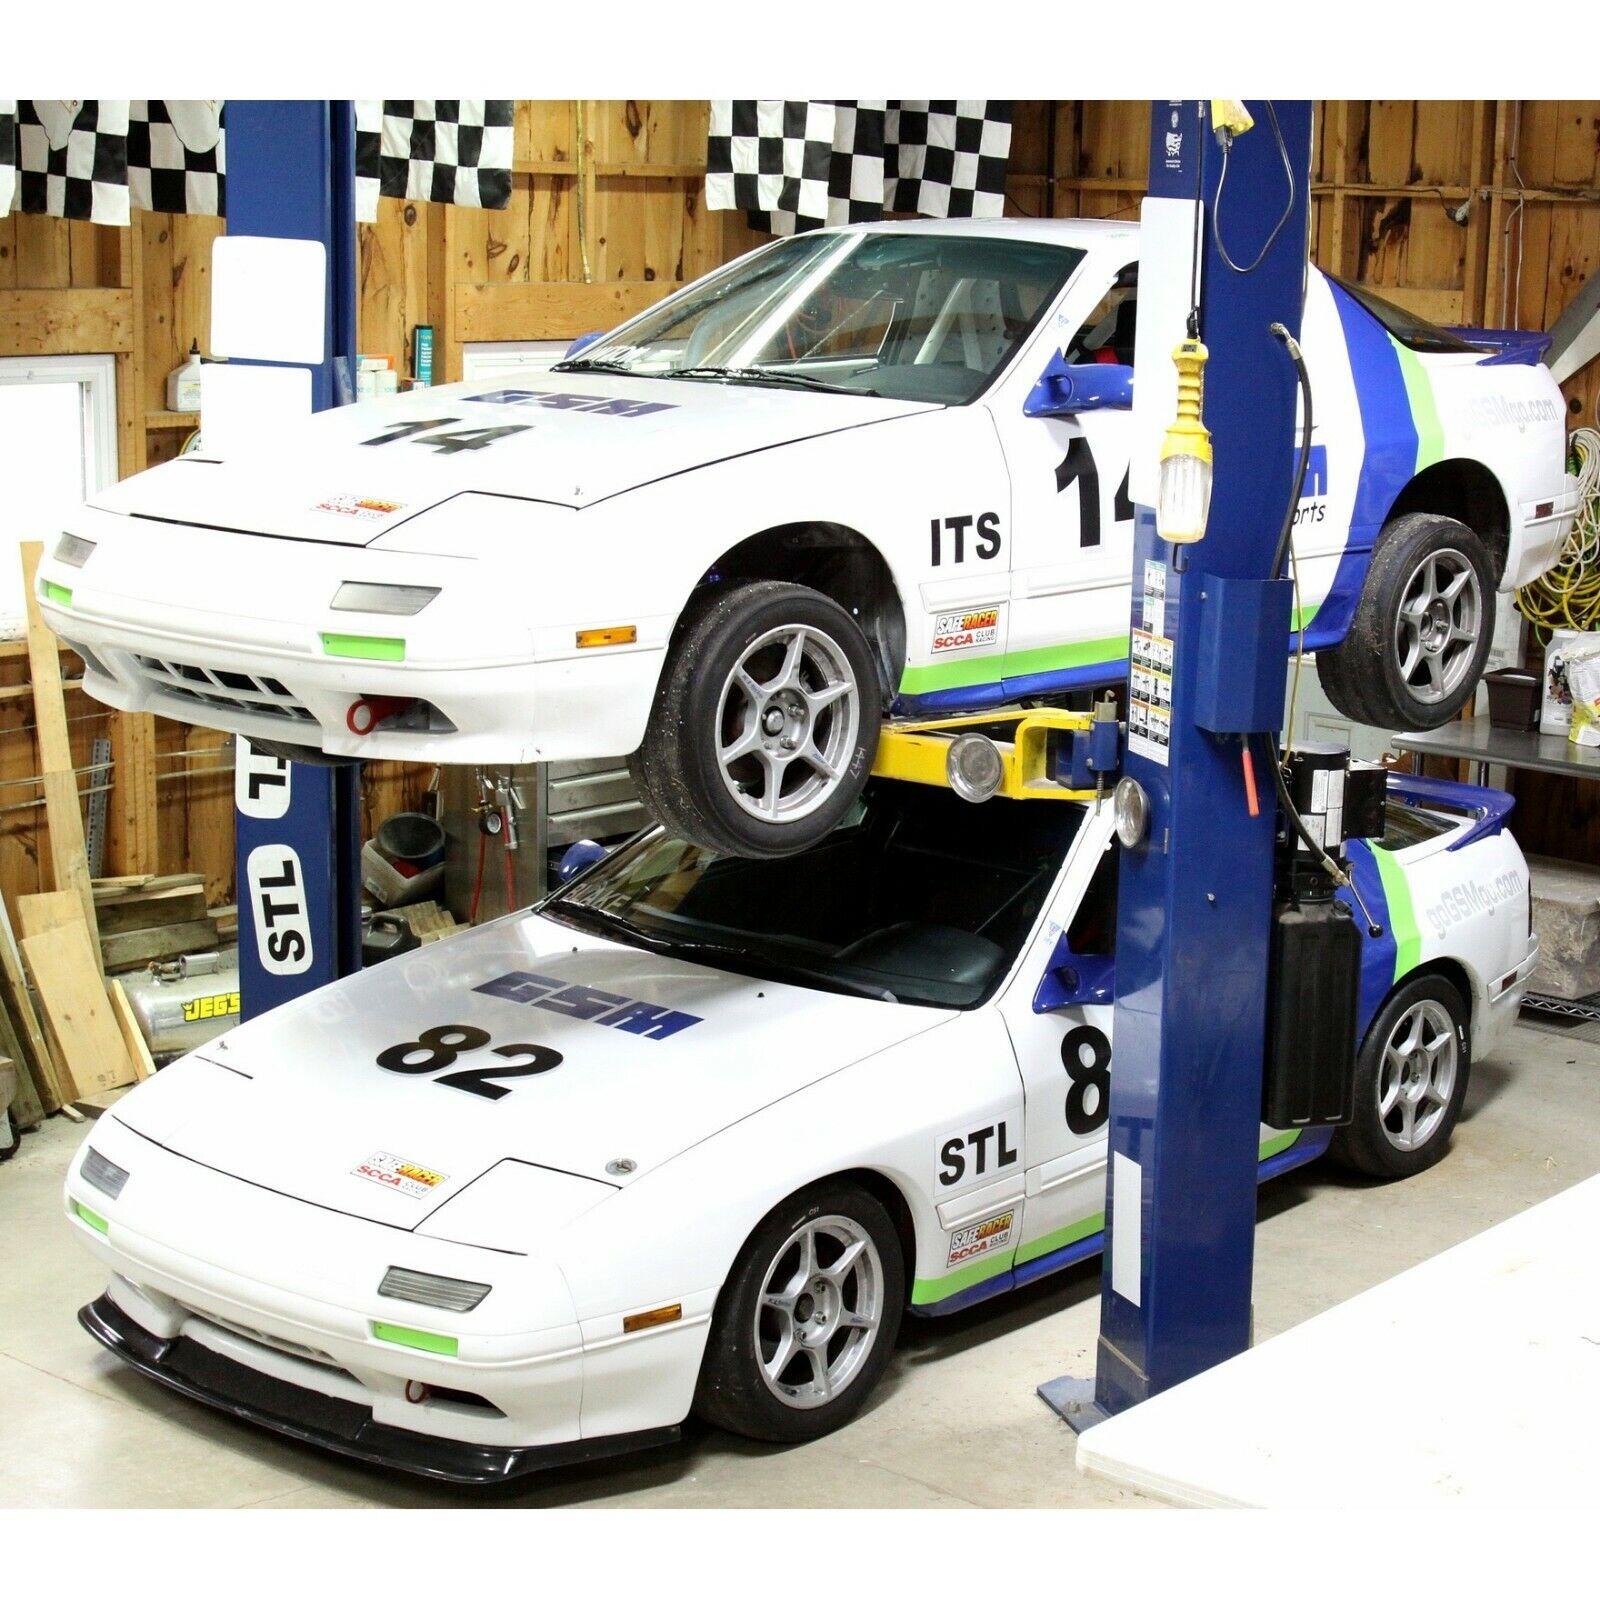 SCCA Race Car Mazda RX7 FC3S 74 wins 2 current track records